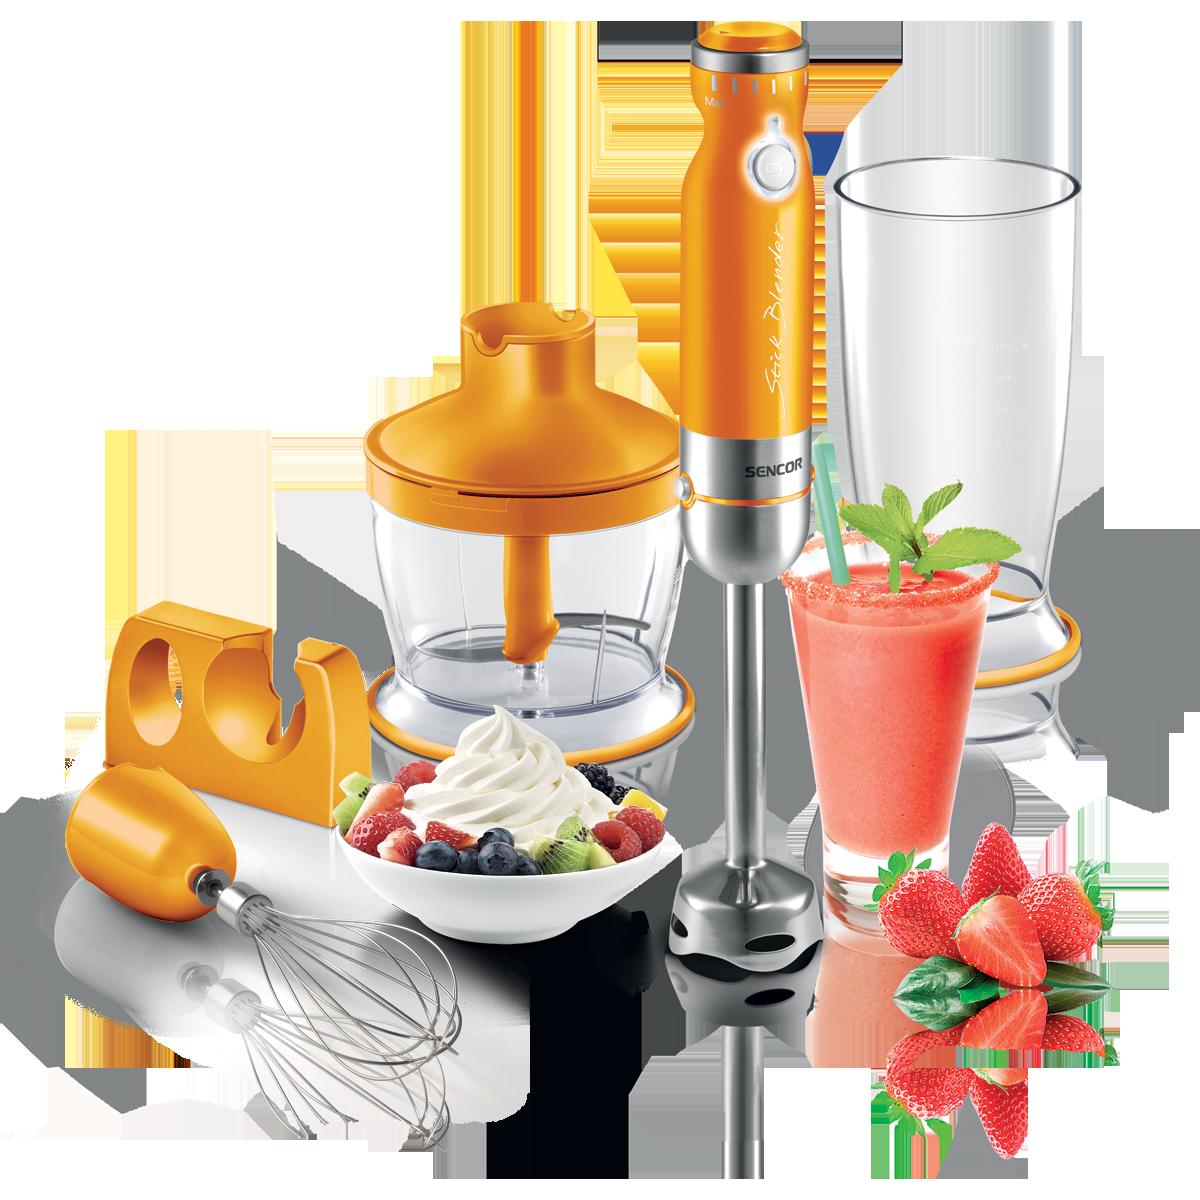 Mixeur plongeant orange de Sencor